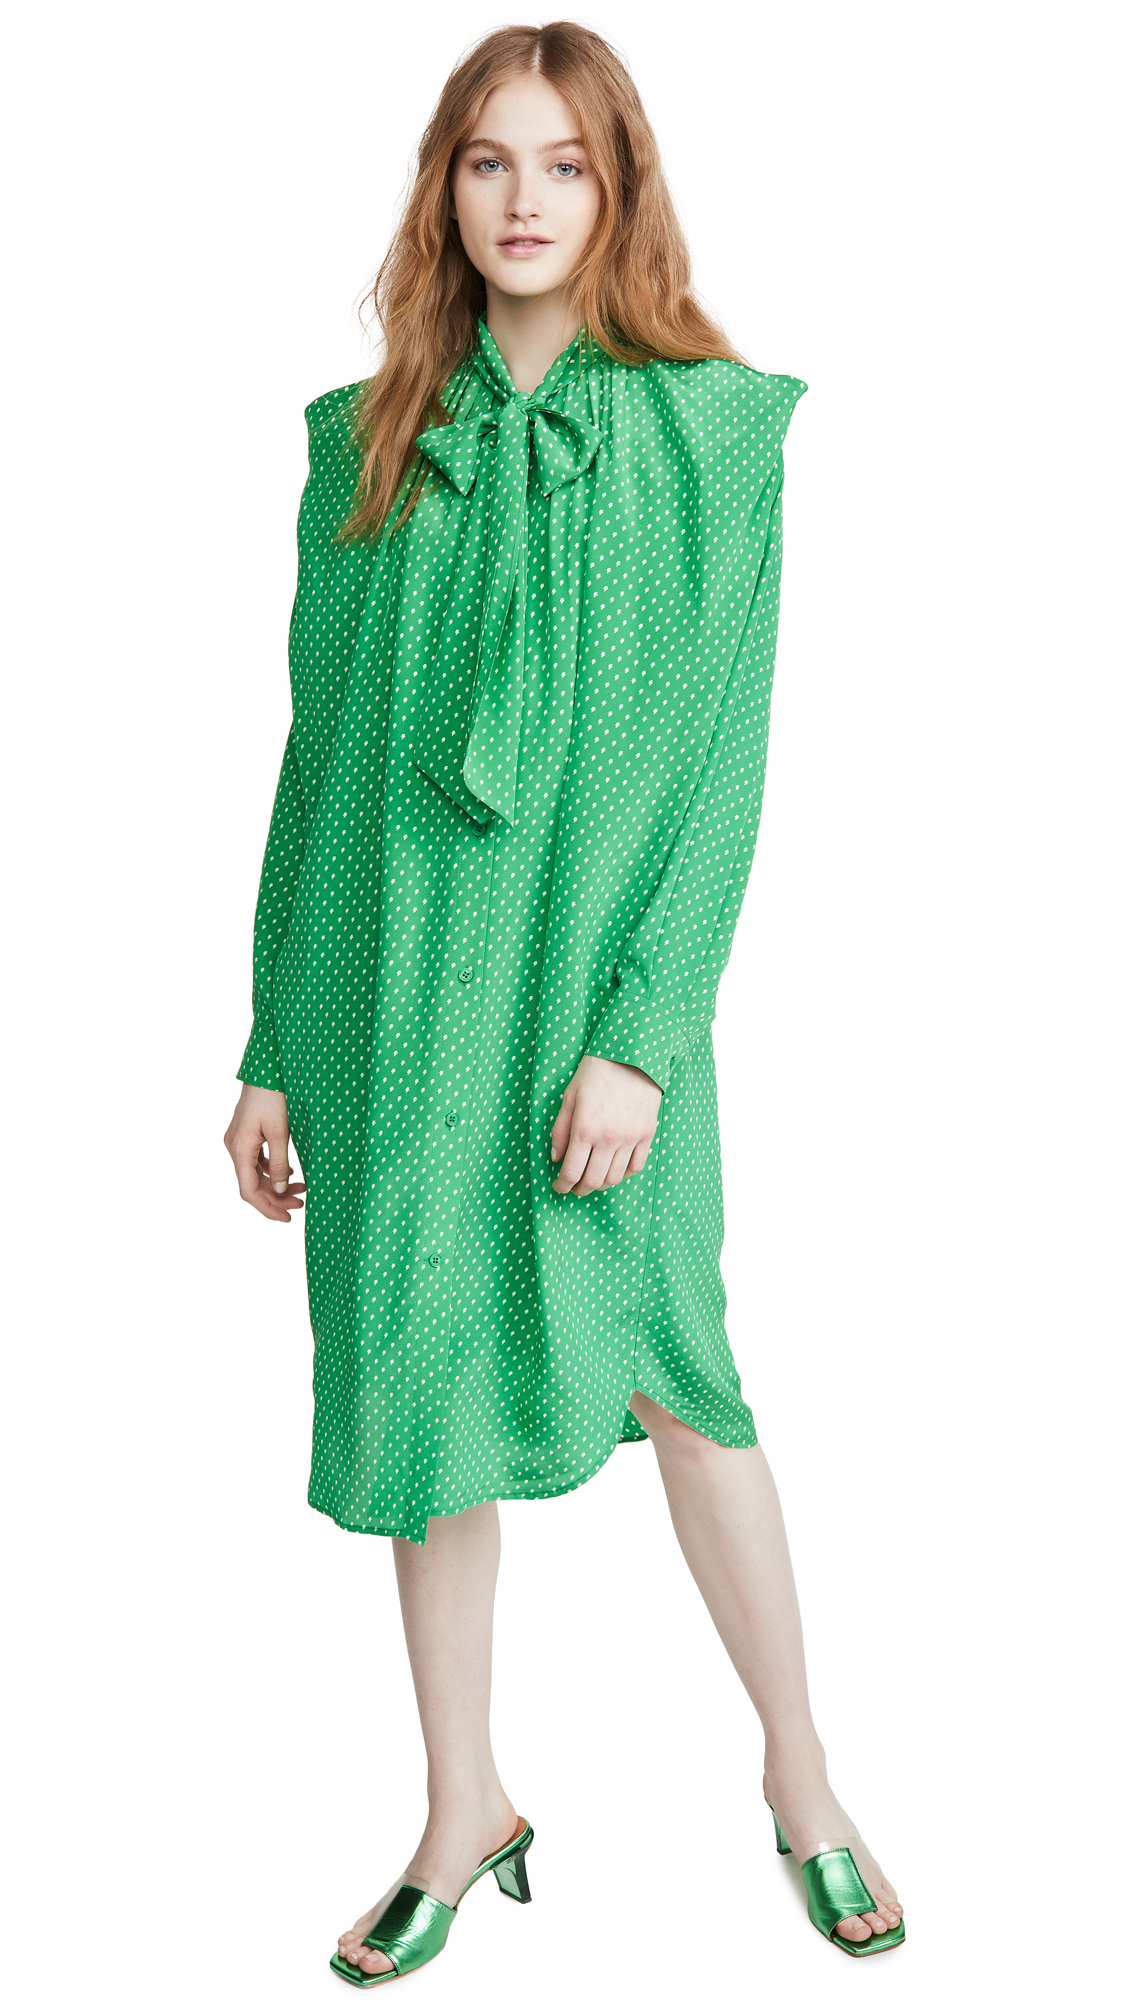 pushBUTTON Ribbon Neck Silk Shirt Dress - 40% Off Sale